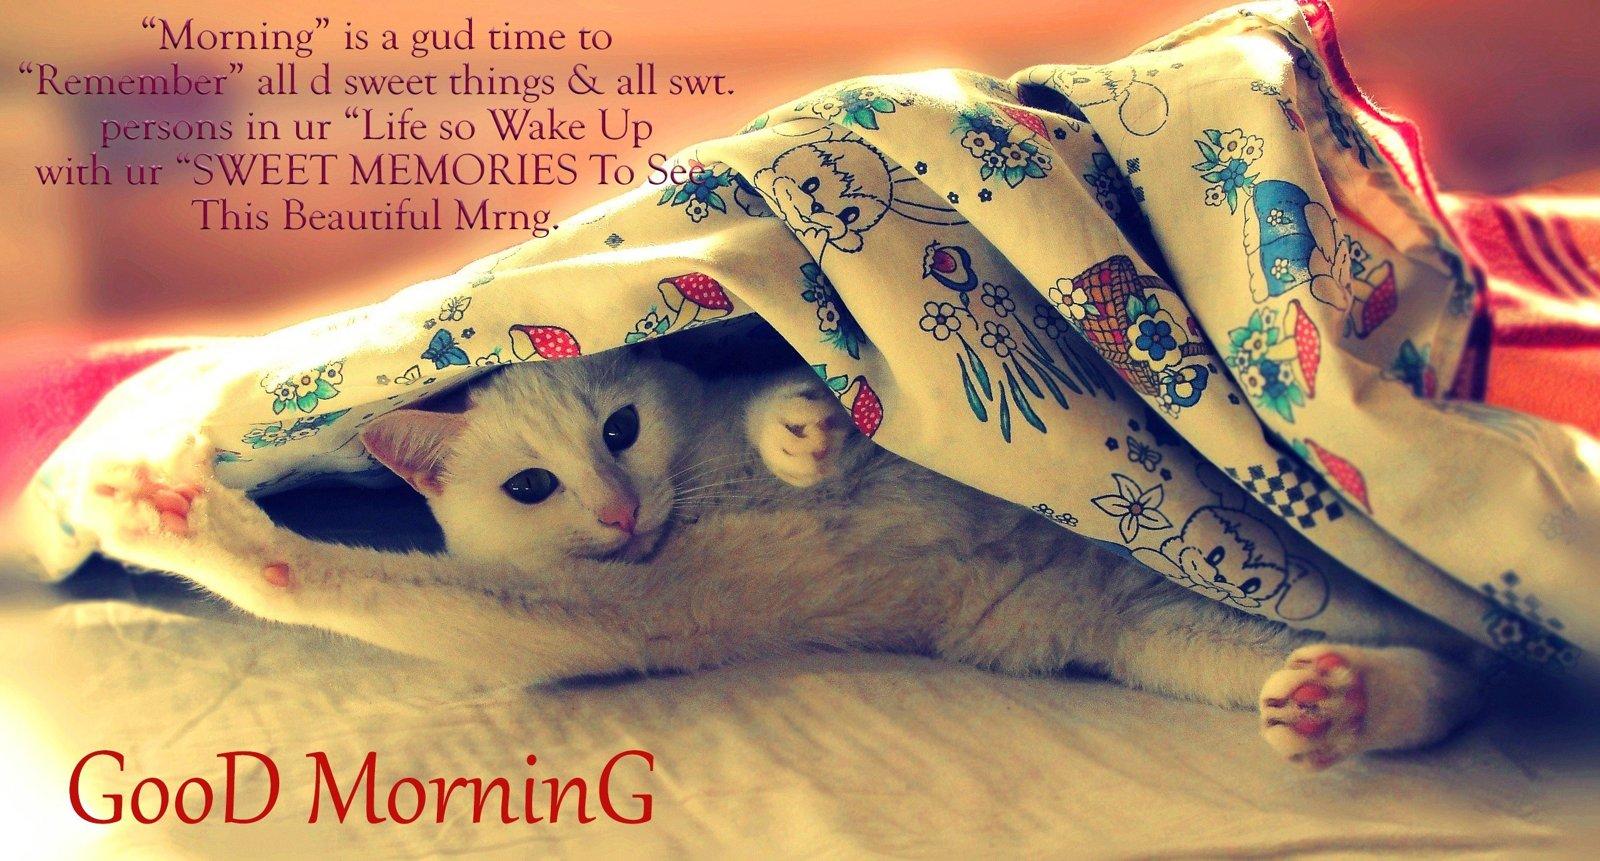 hinh anh good morning dep